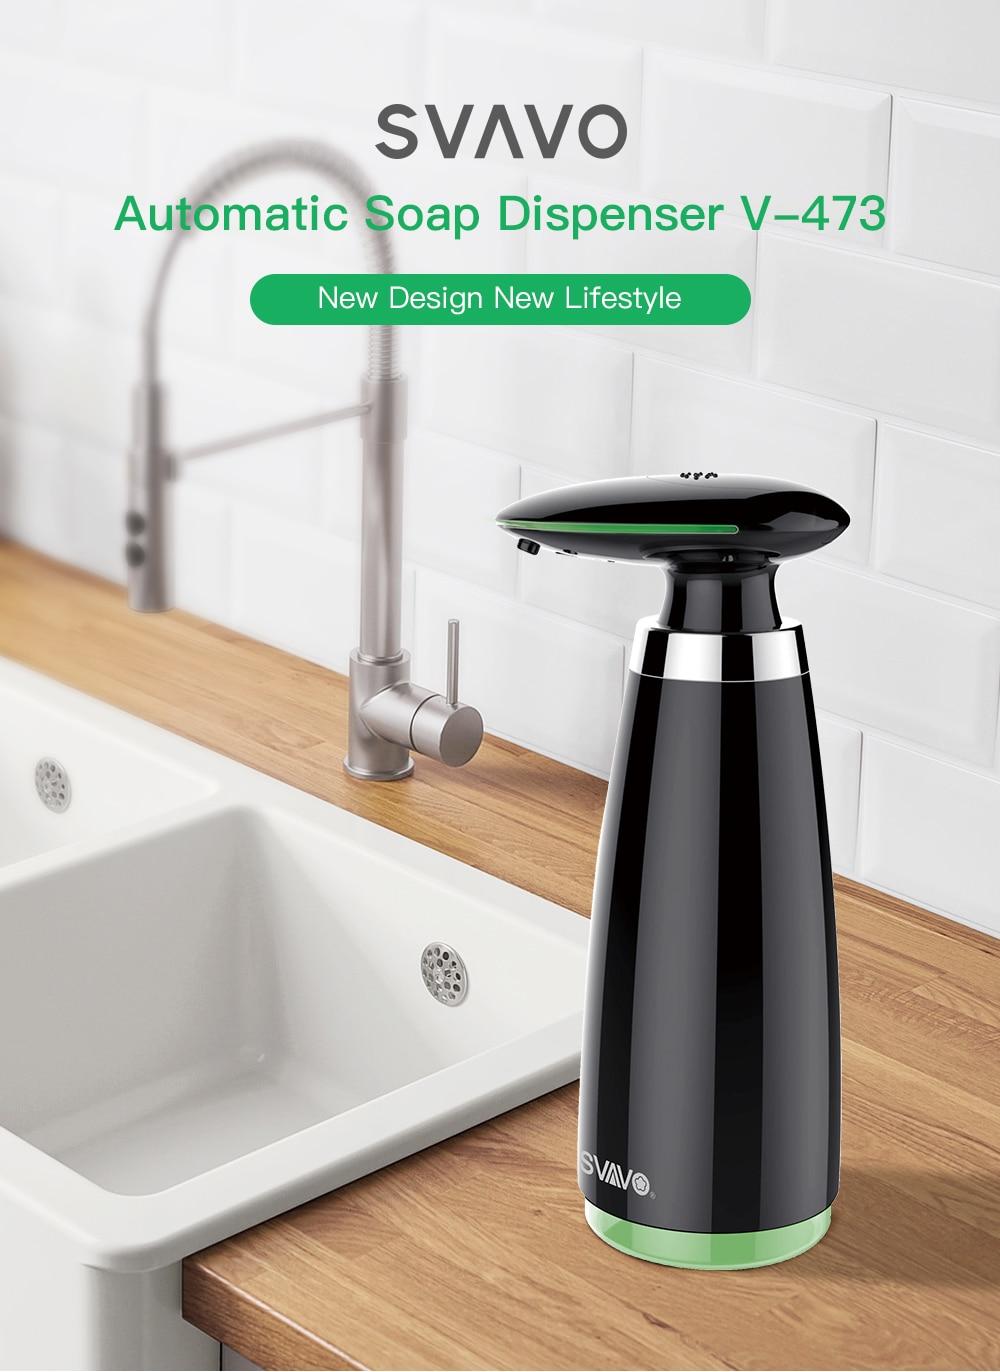 H6c3985c7ddd94929b71569ff78bb5811i SVAVO 350ml Automatic Soap Dispenser Infrared Touchless Motion Bathroom Dispenser Smart Sensor Liquid Soap Dispenser for Kitchen